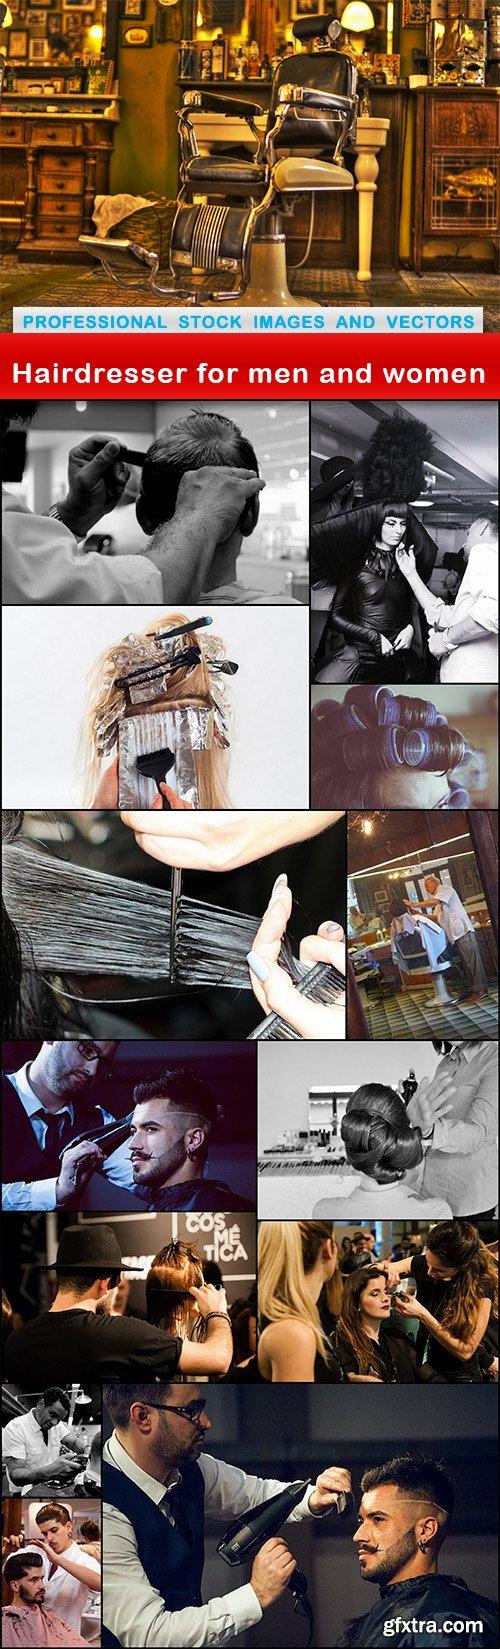 Hairdresser for men and women - 14 UHQ JPEG